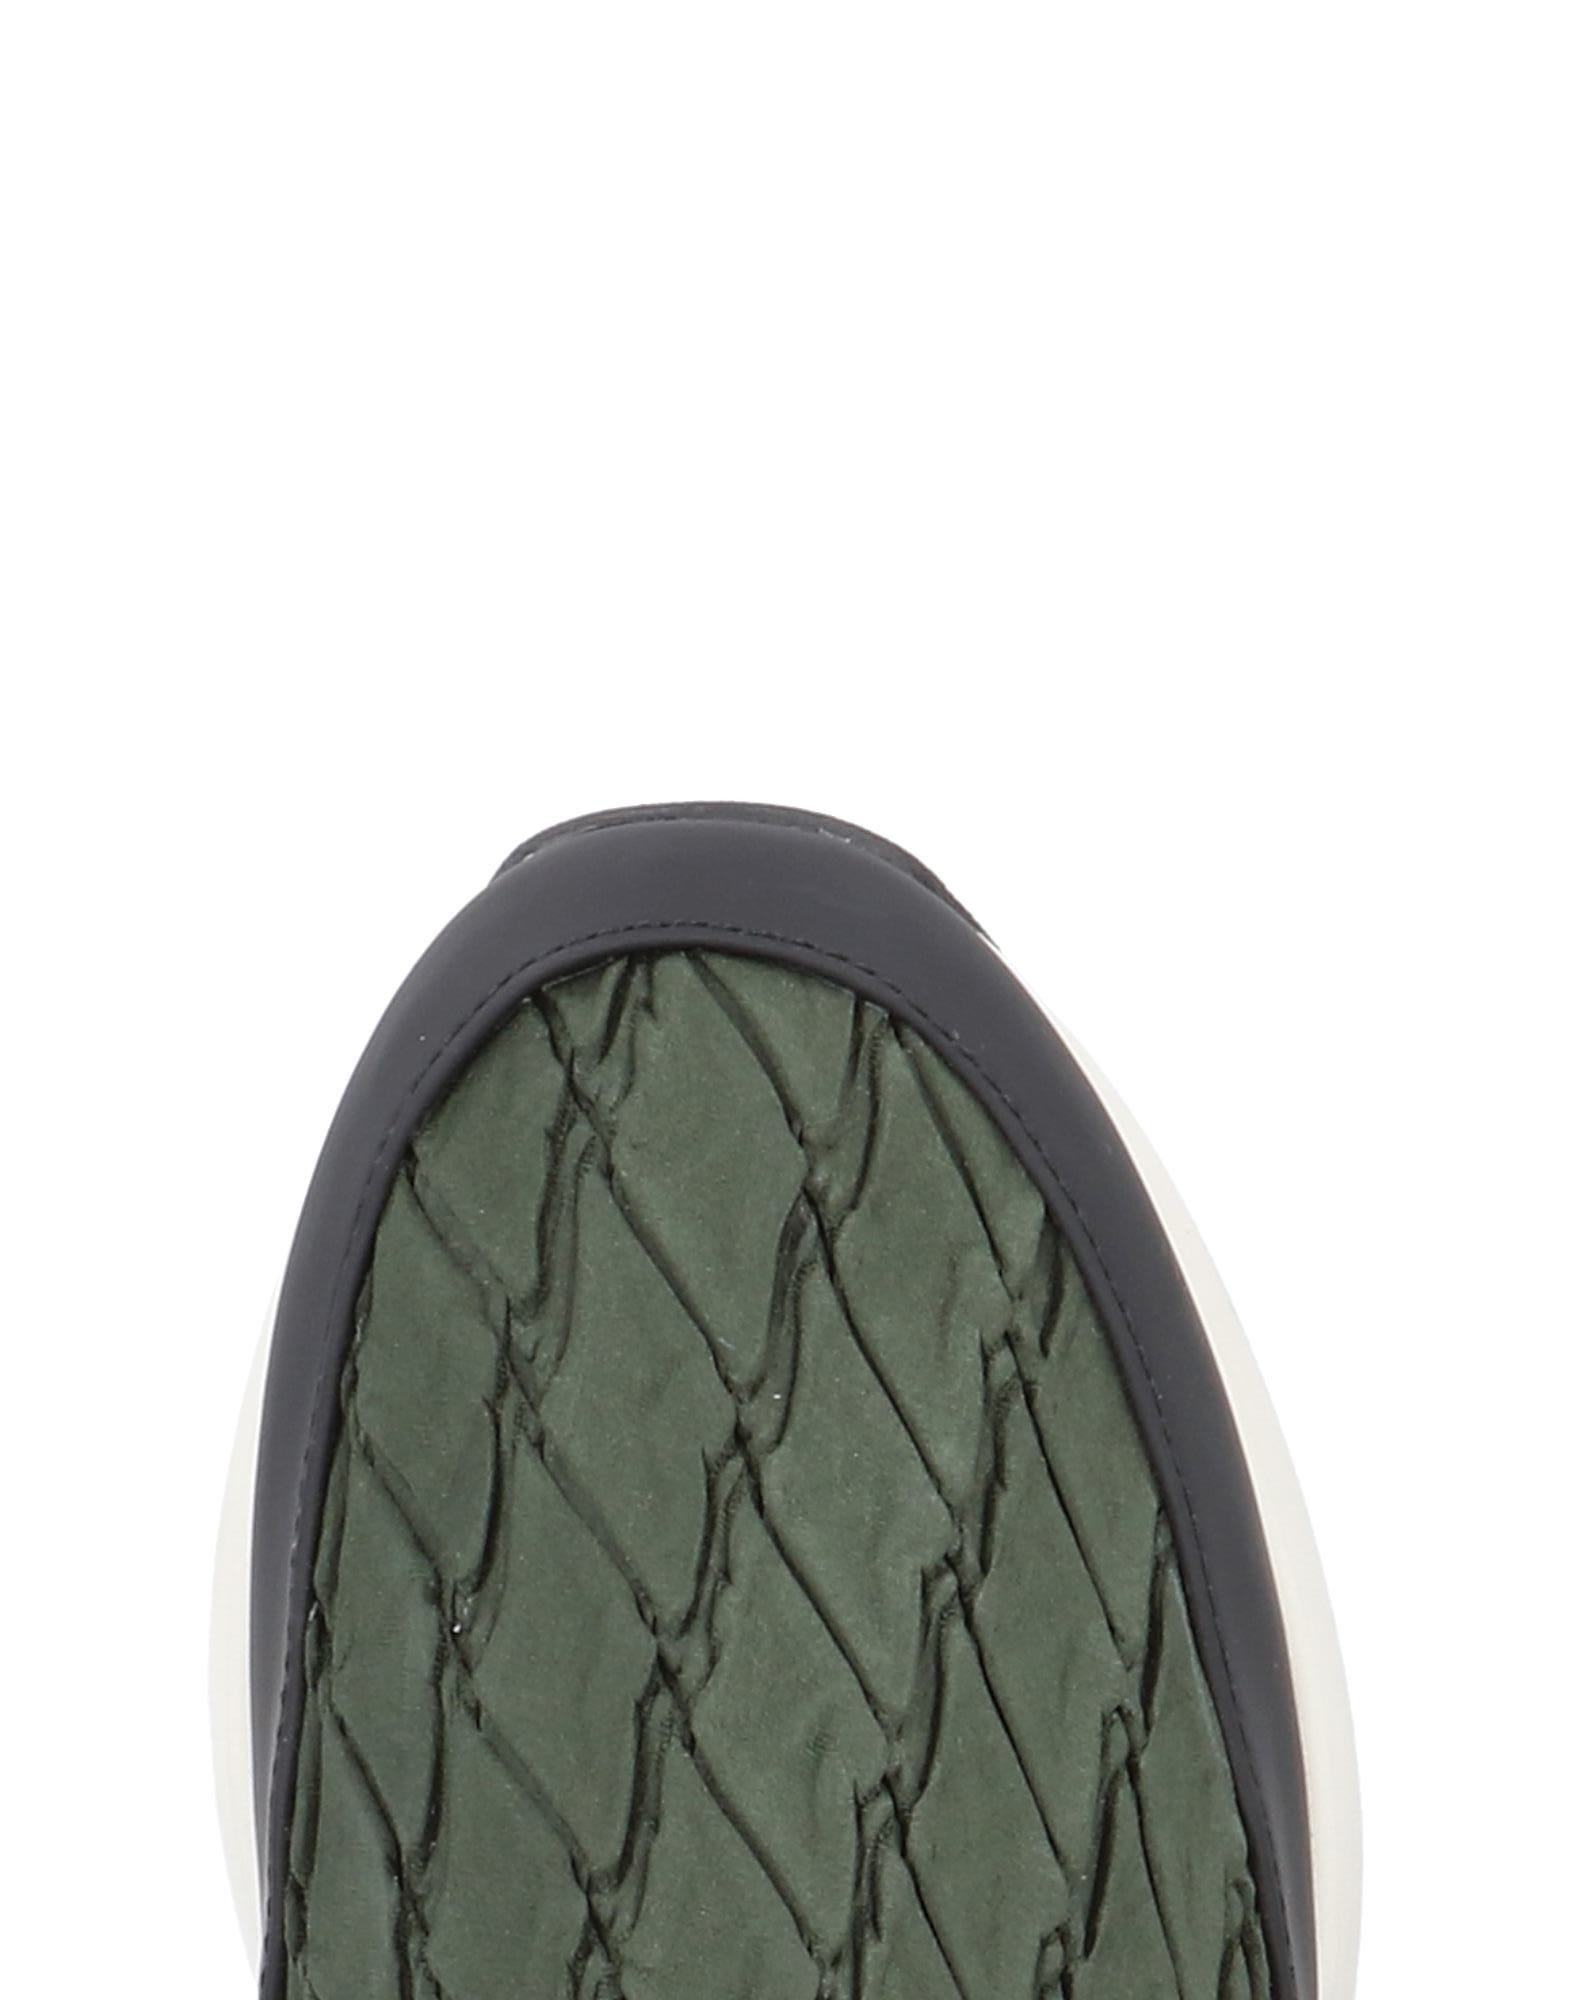 Gut um billige Schuhe zu  tragenAlexander Smith Sneakers Damen  zu 11501125PL 24c2a9